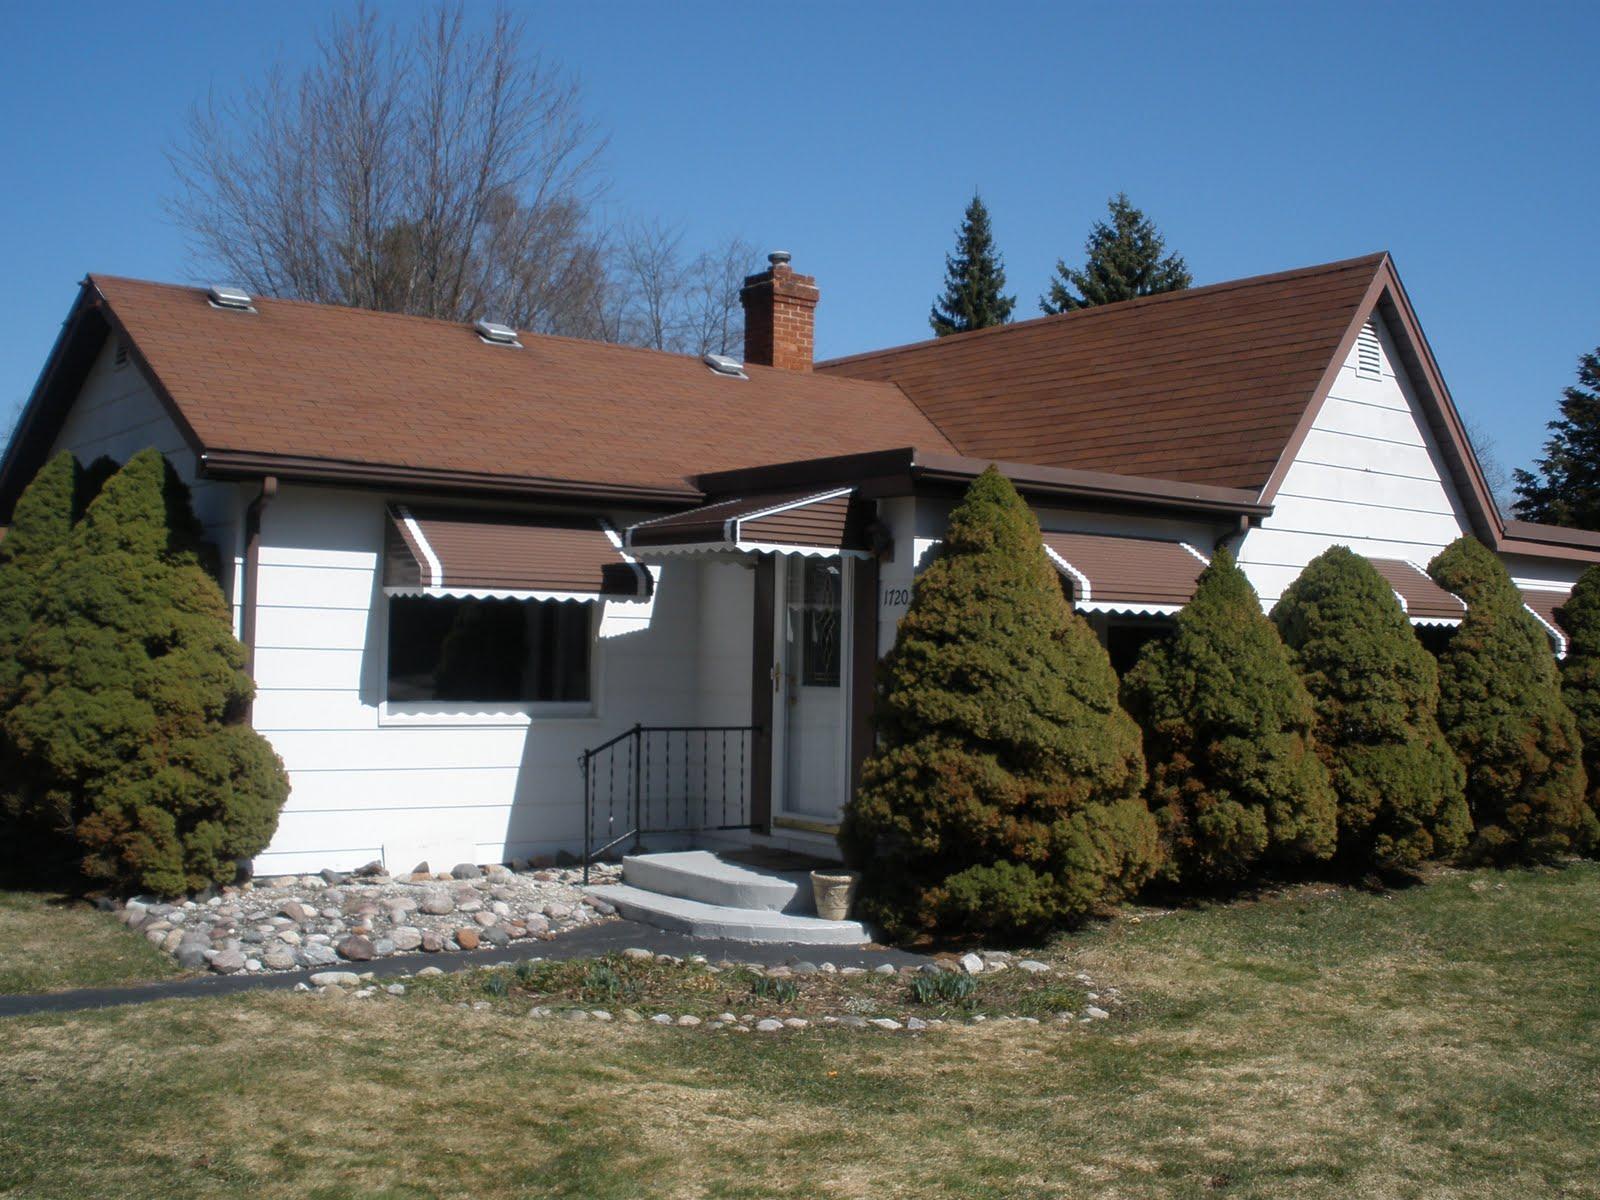 18 artistic modest house home plans blueprints 69911 for Modest home plans